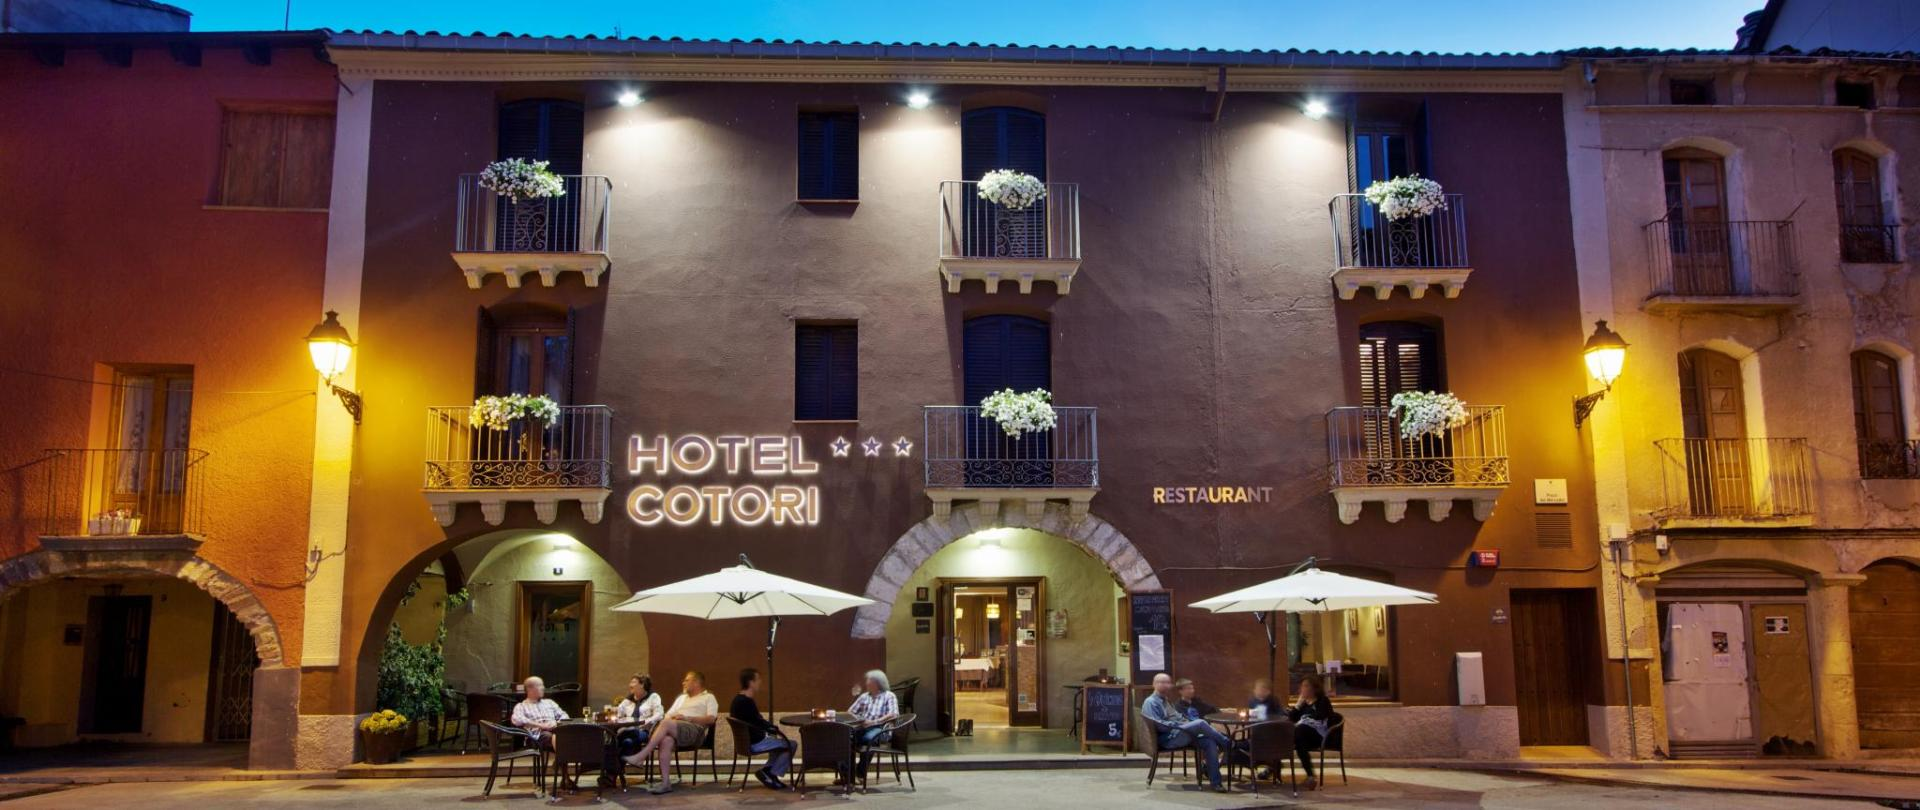 HOTEL COTORI 07 - Foto Sergi Ricart.JPG